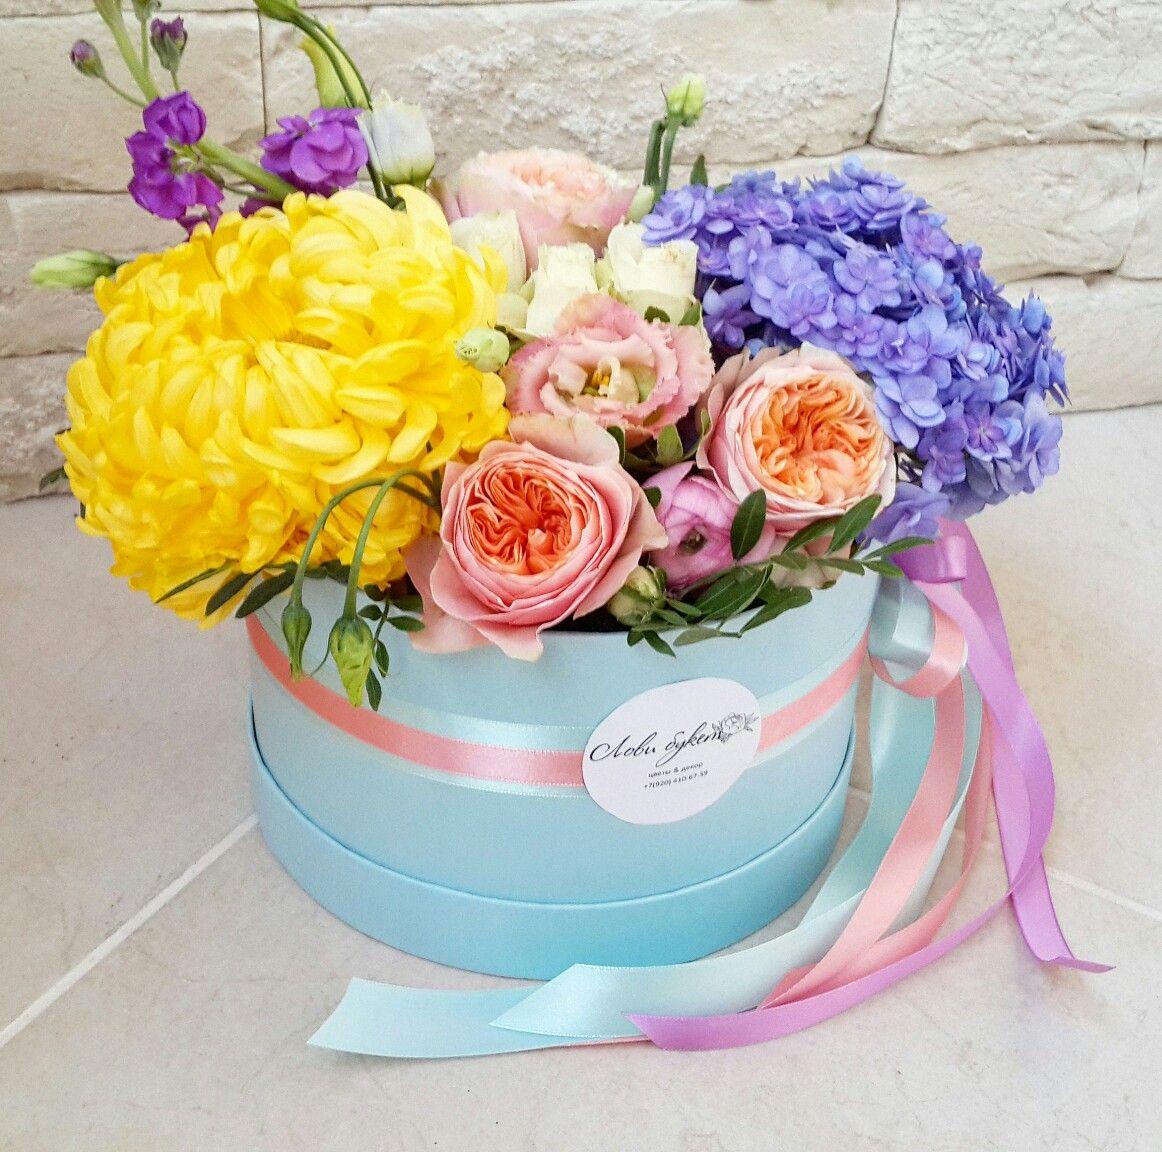 Цветы в коробках картинки доброго дня